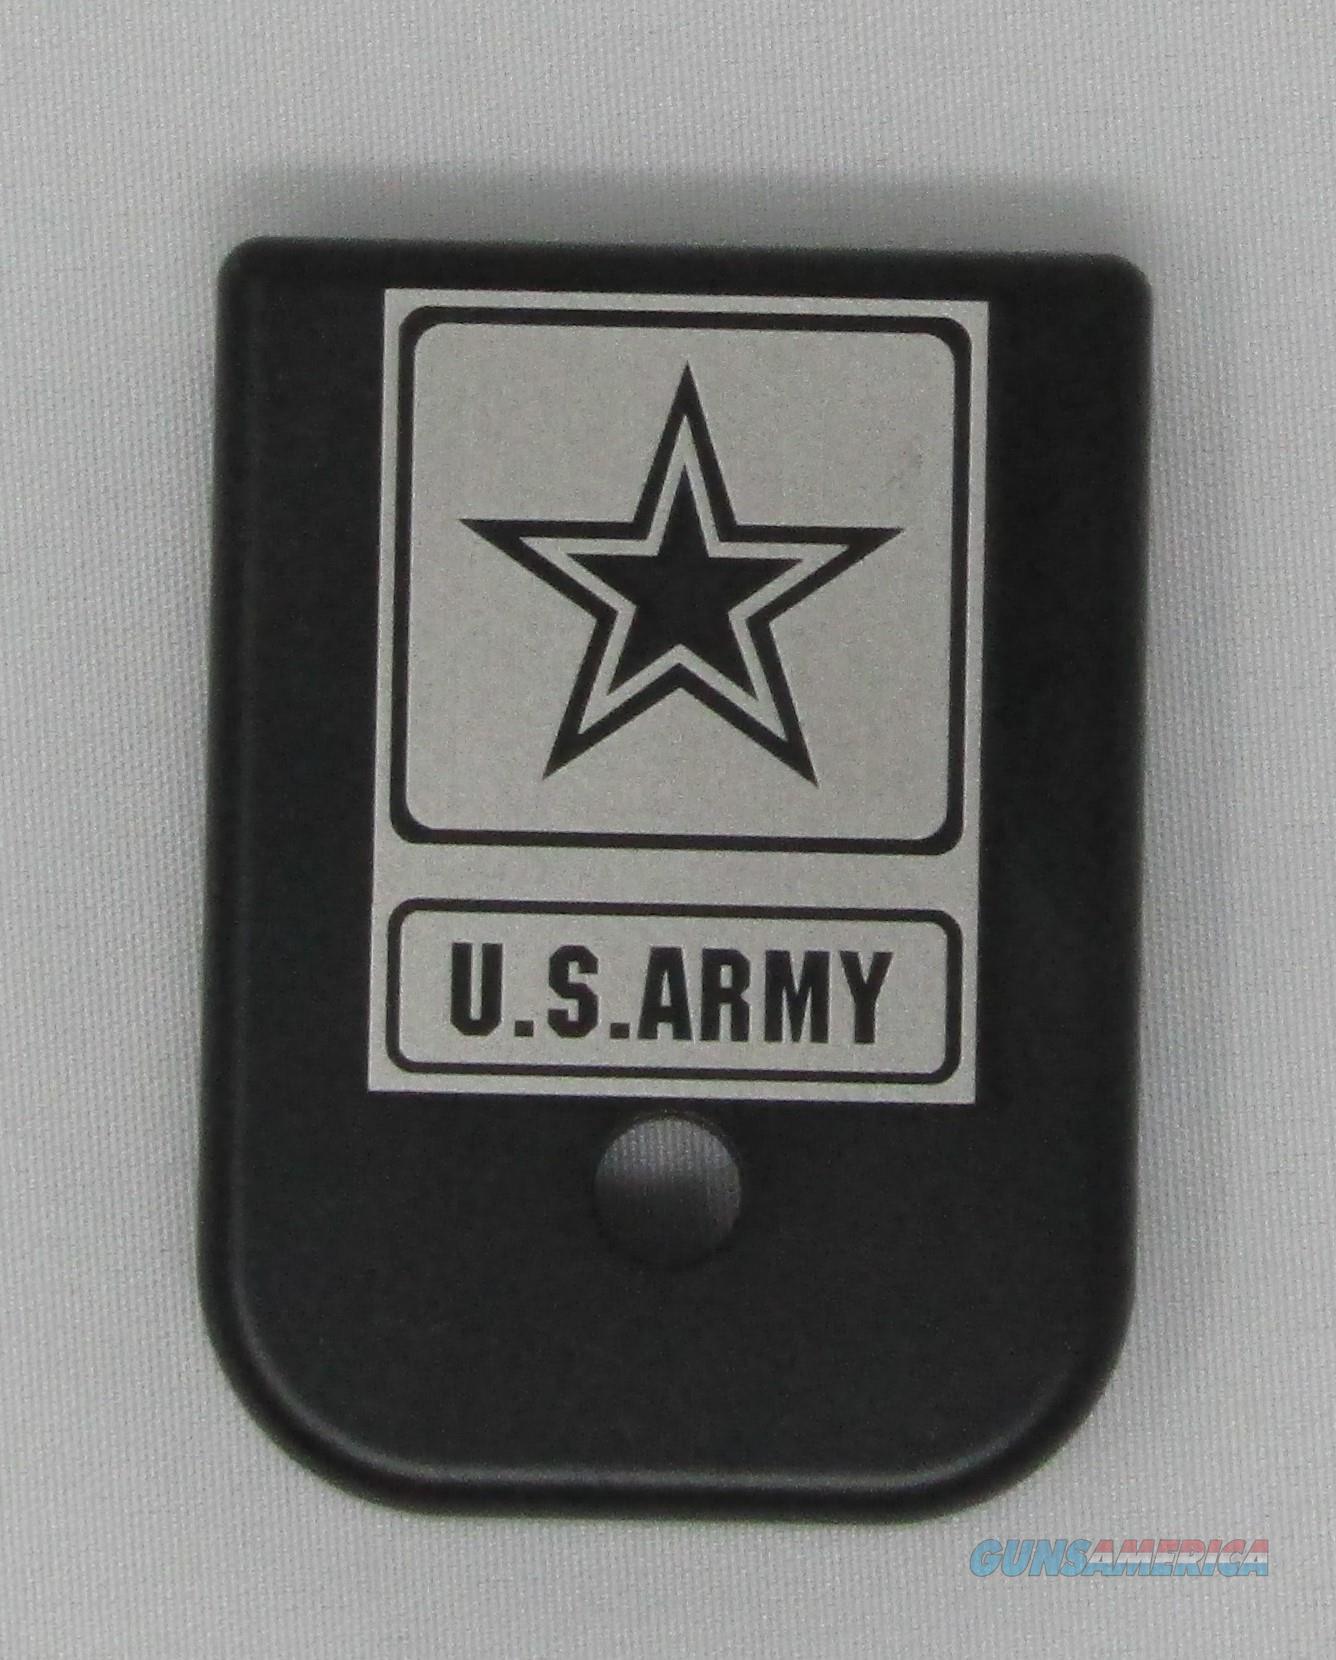 Laser Engraved Glock Mag Base Plate Army  Non-Guns > Gun Parts > Misc > Pistols